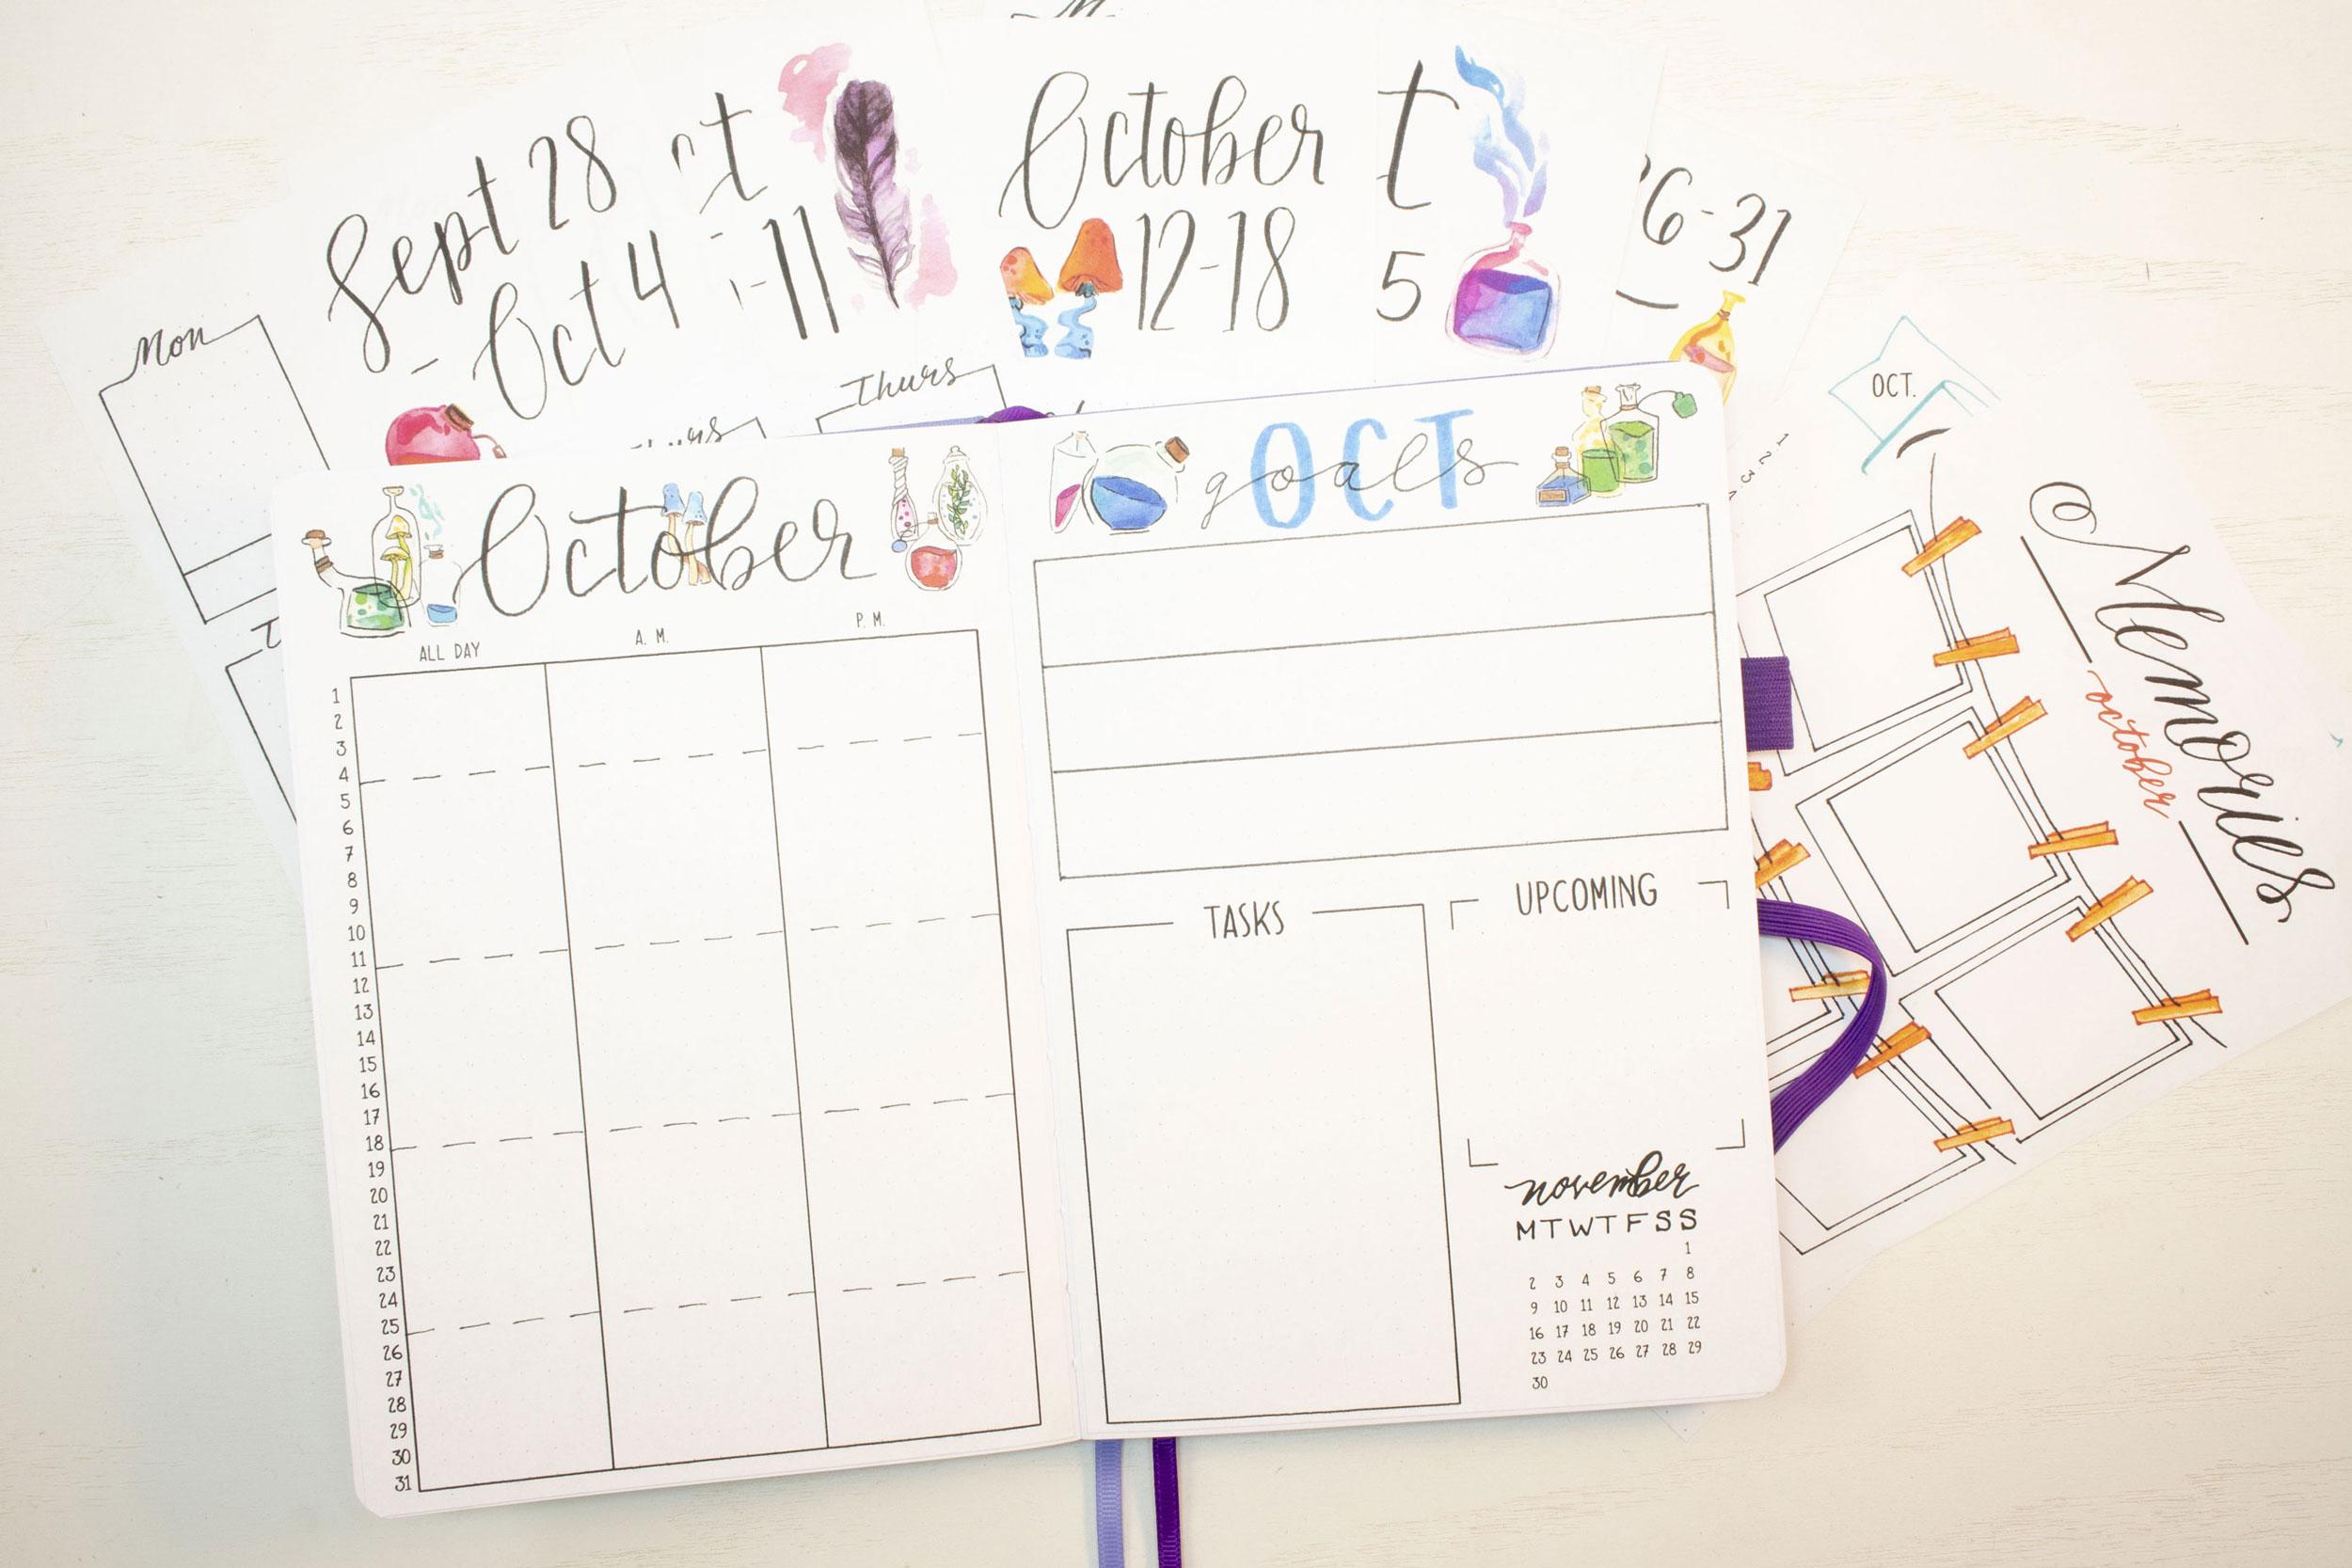 October 2020 Bullet Journal weeklies, calendar, and goals spreads.